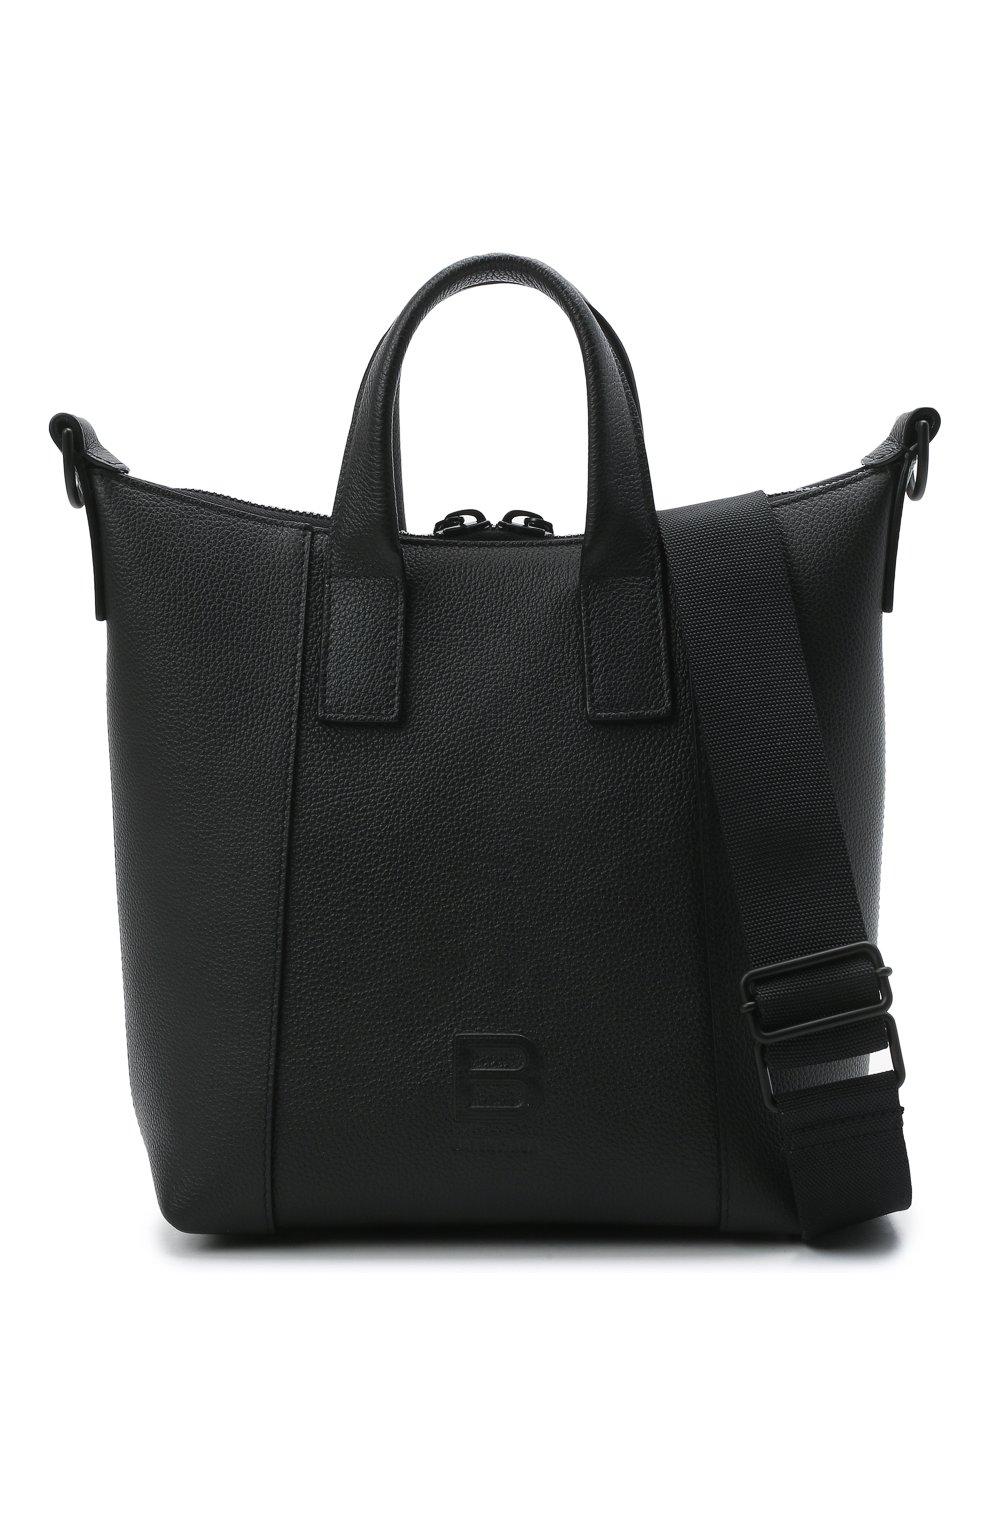 Мужская кожаная сумка-тоут hourglass BALENCIAGA черного цвета, арт. 644718/15Y37 | Фото 6